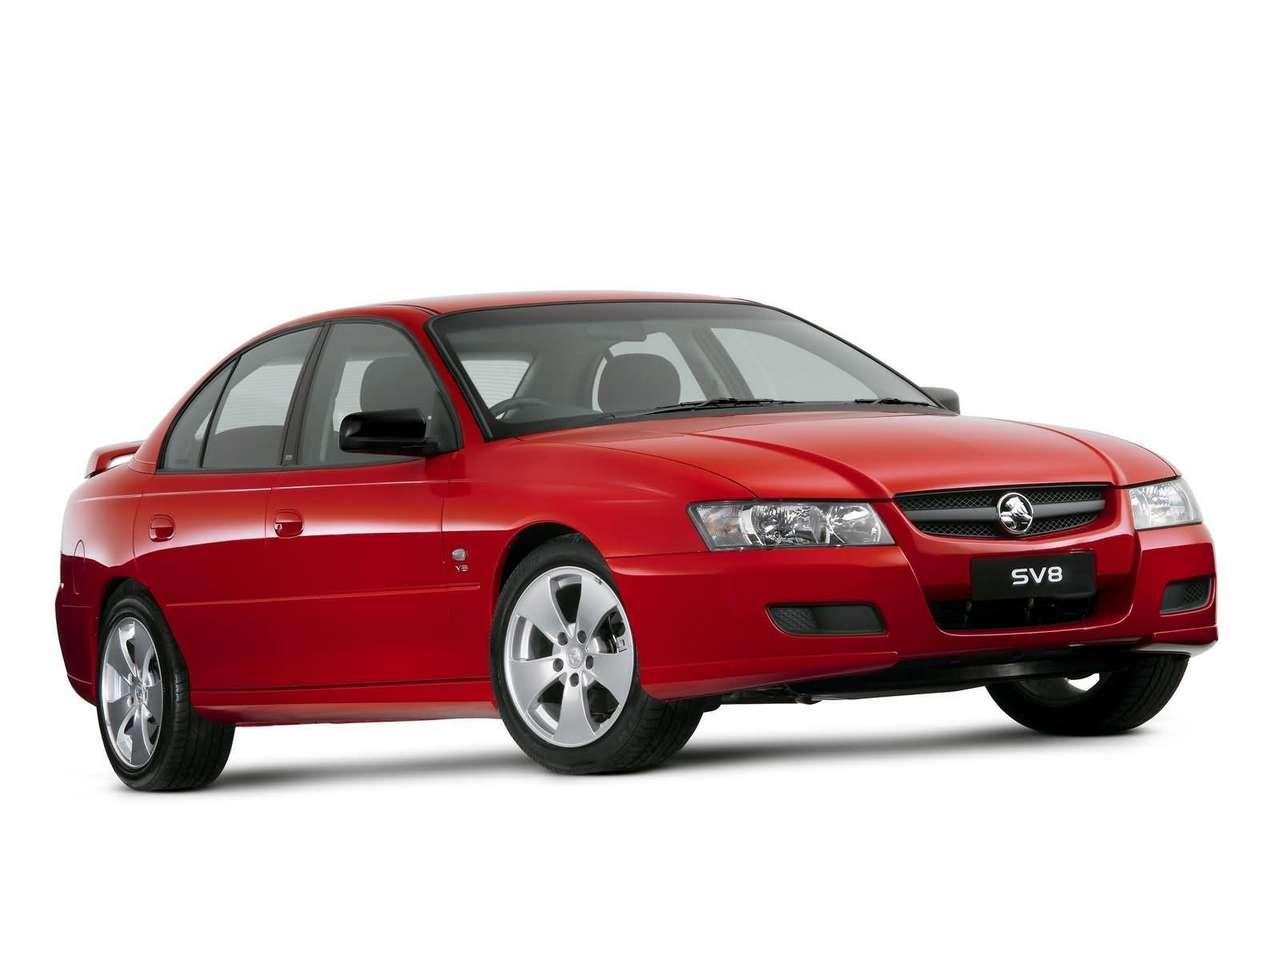 2004 Holden Vz Commodore Sv8